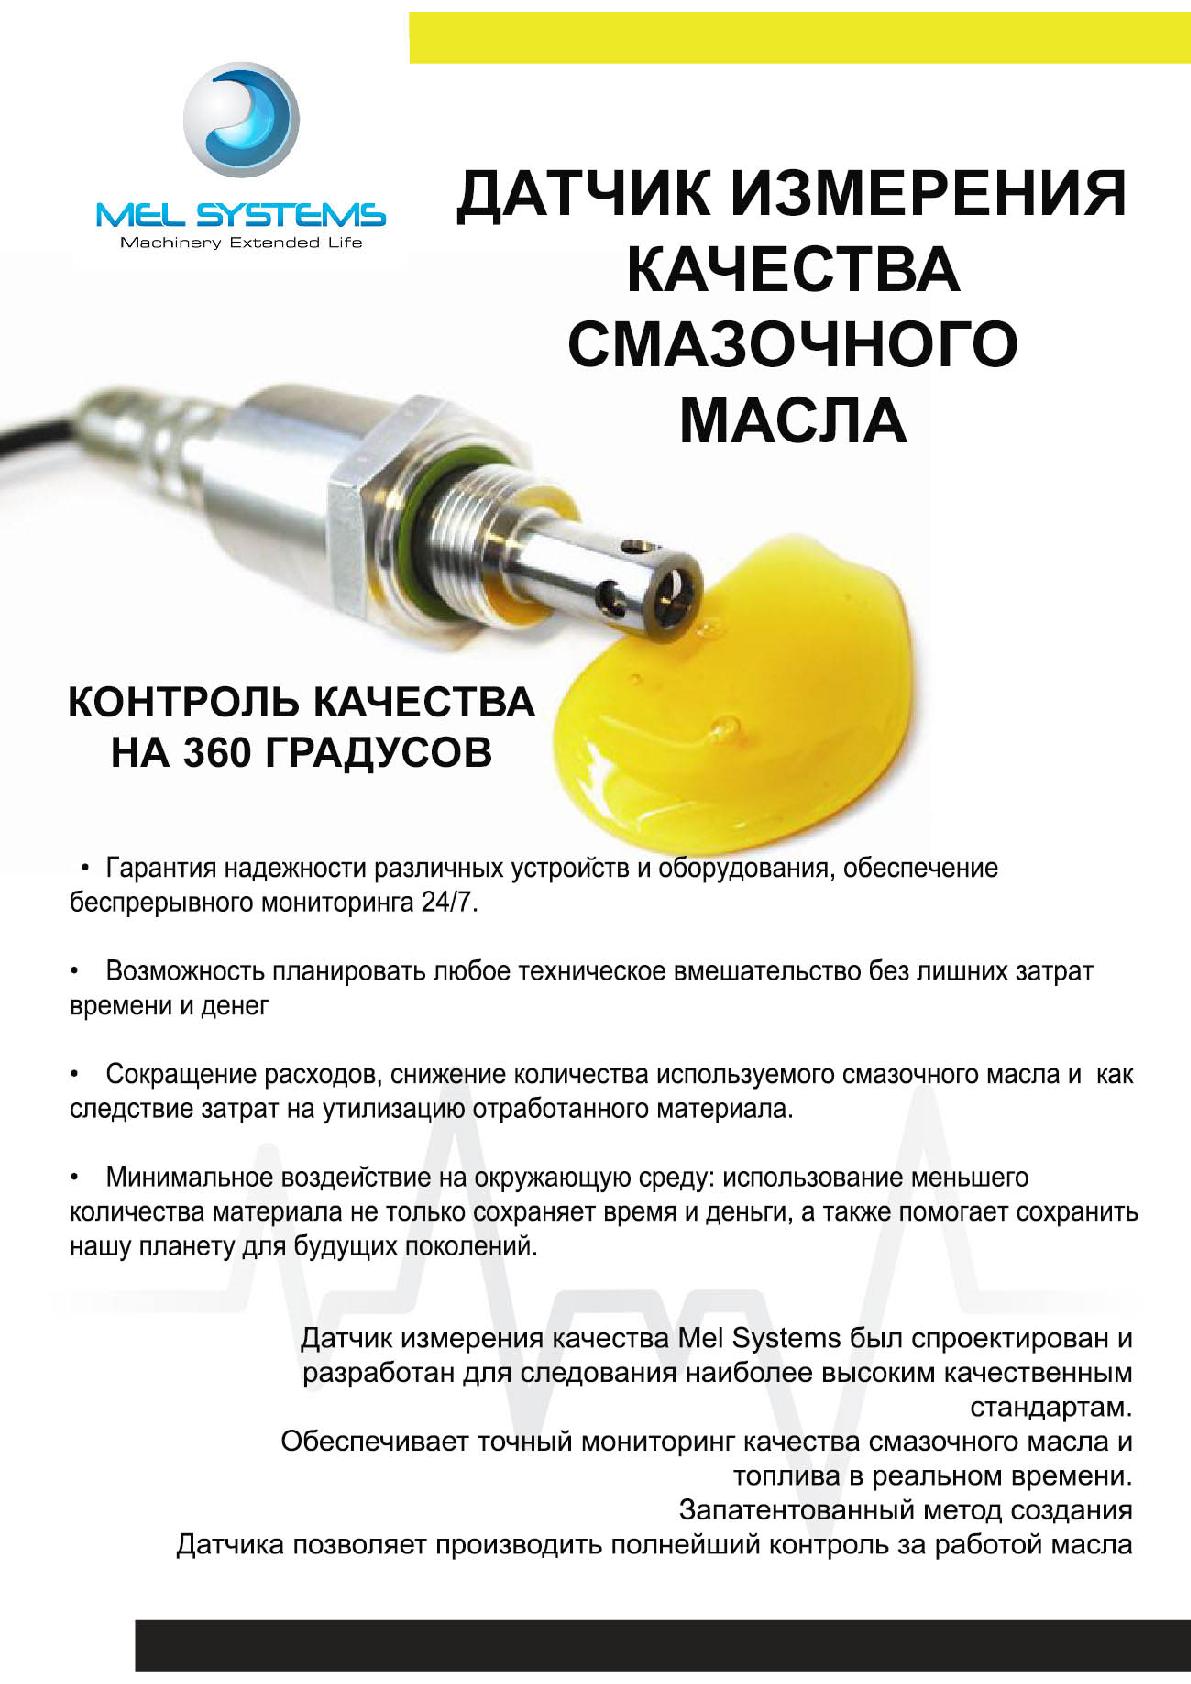 OQS Sensor RUSSO final1